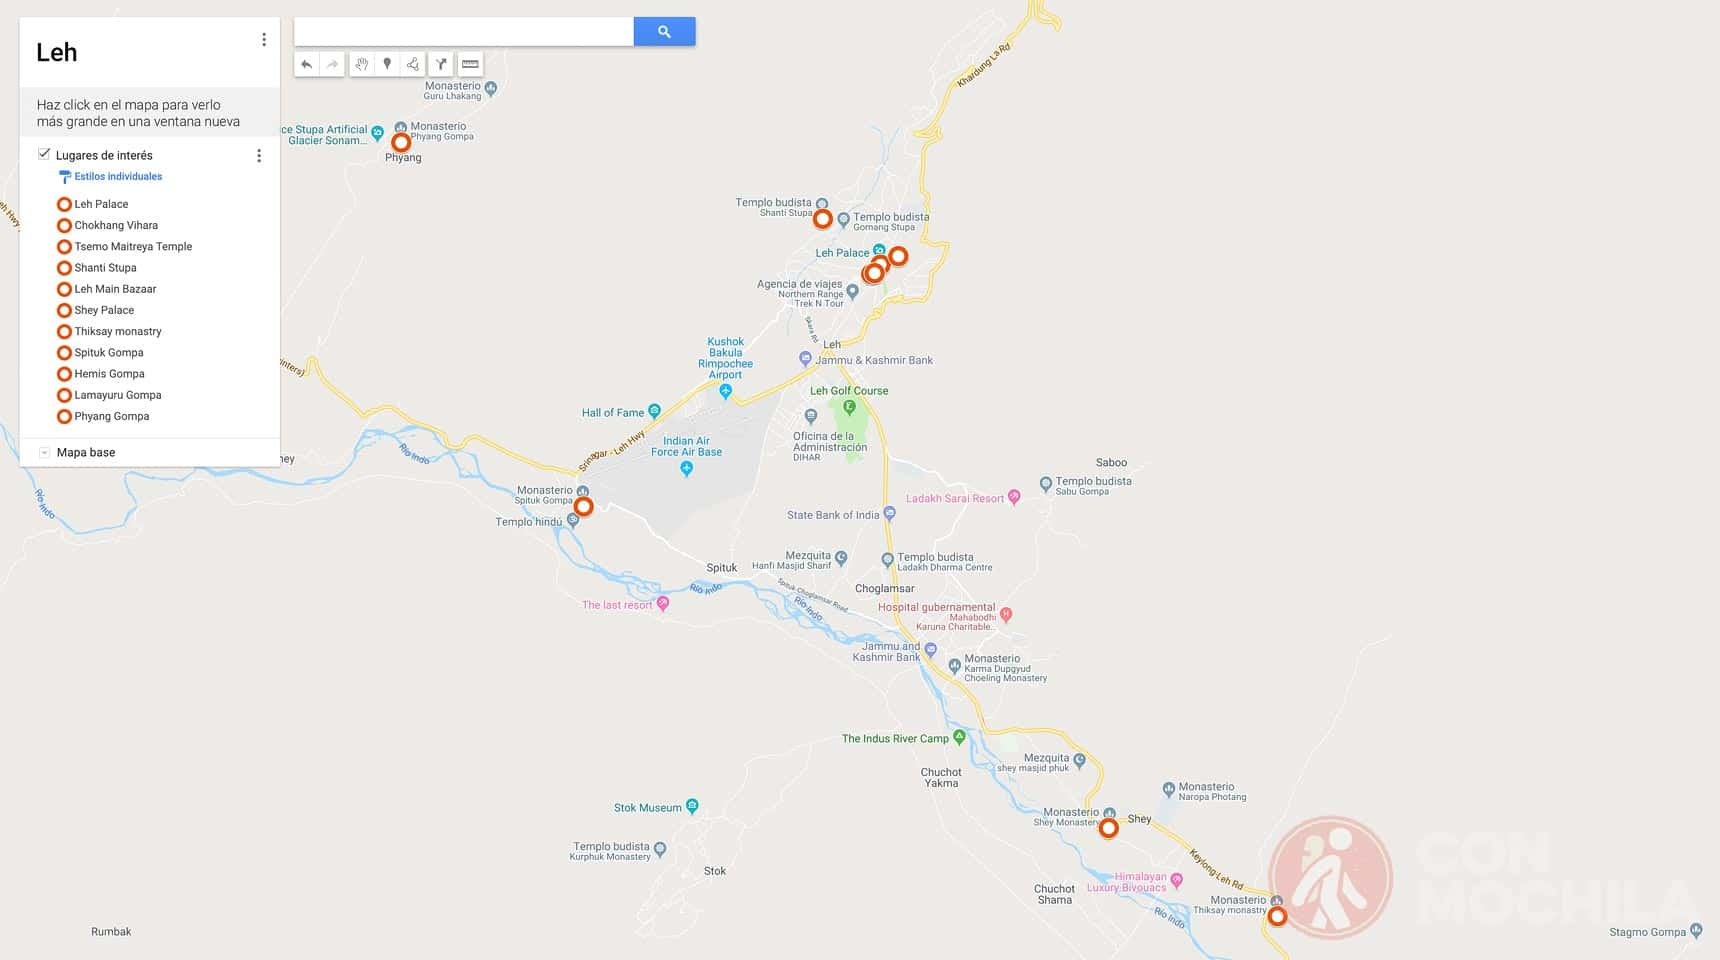 Mapa de Leh